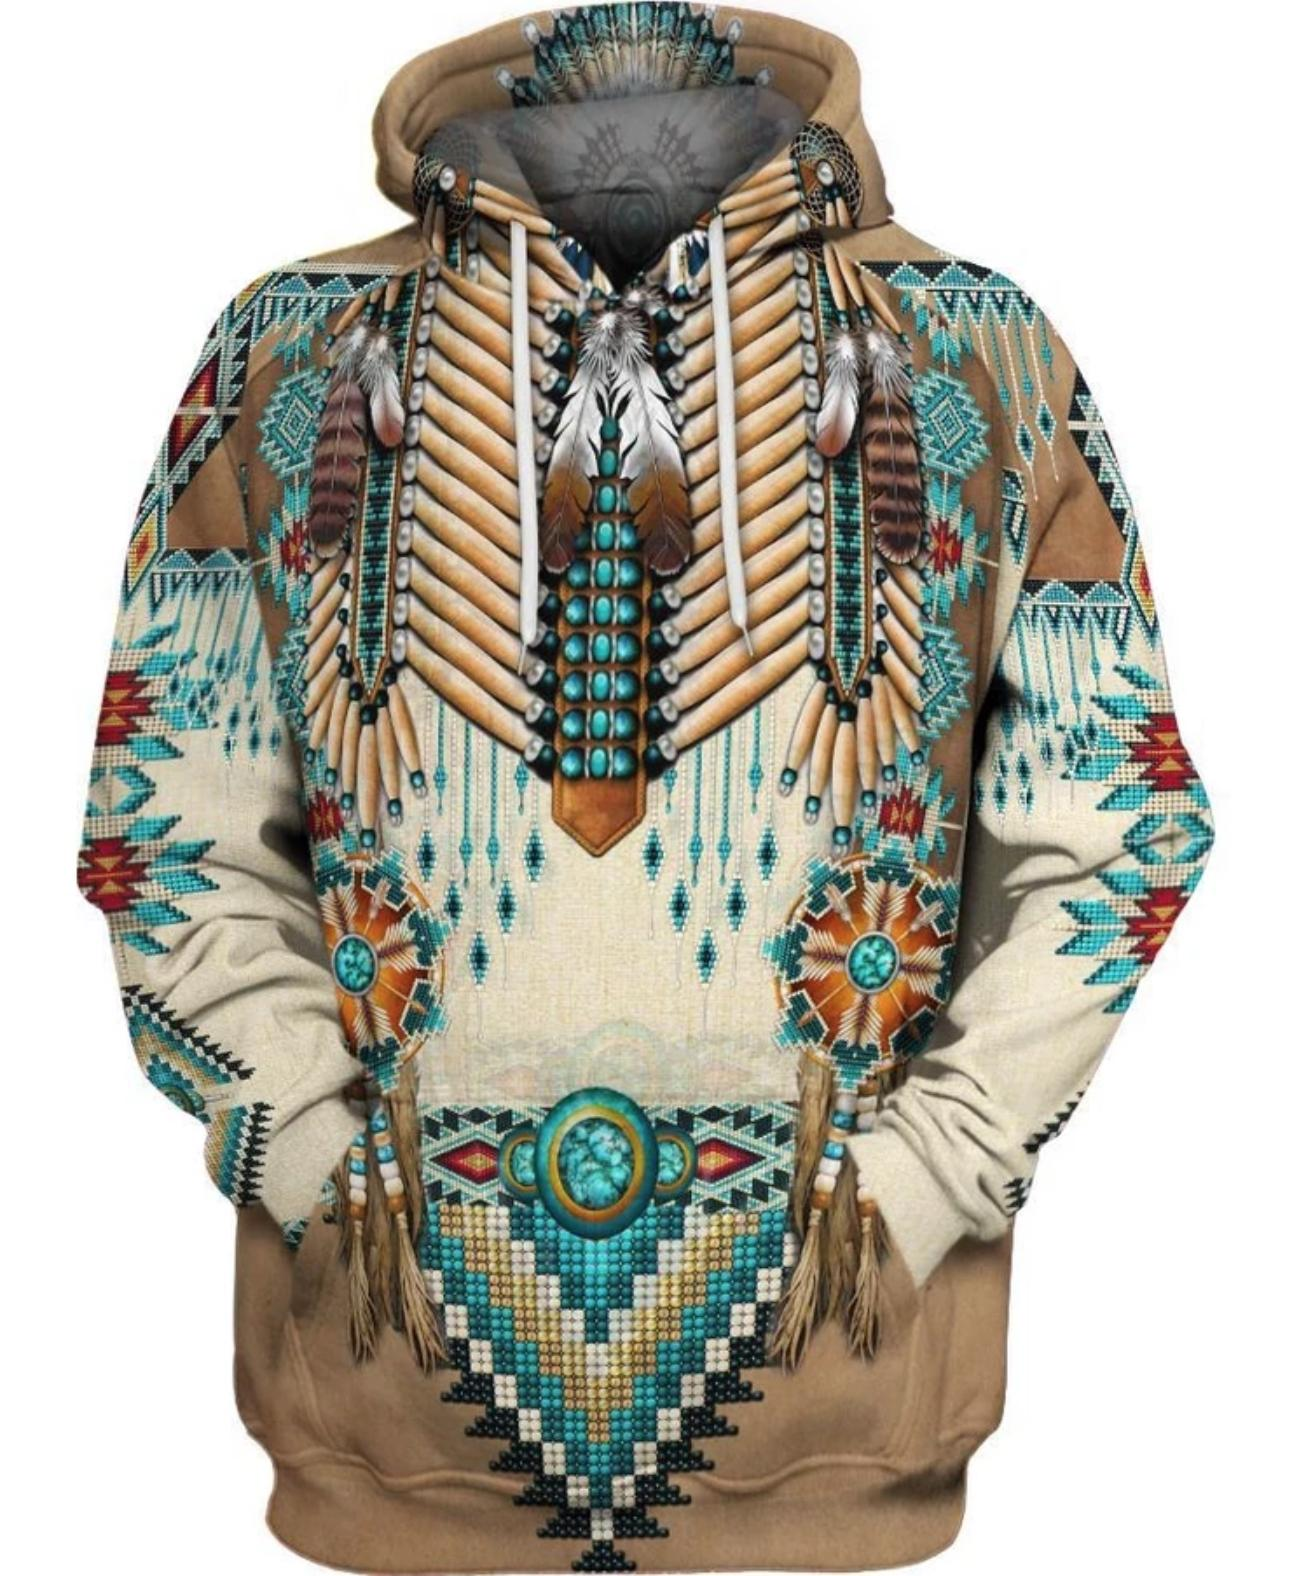 Apache warrior native american all over print hoodie - maria